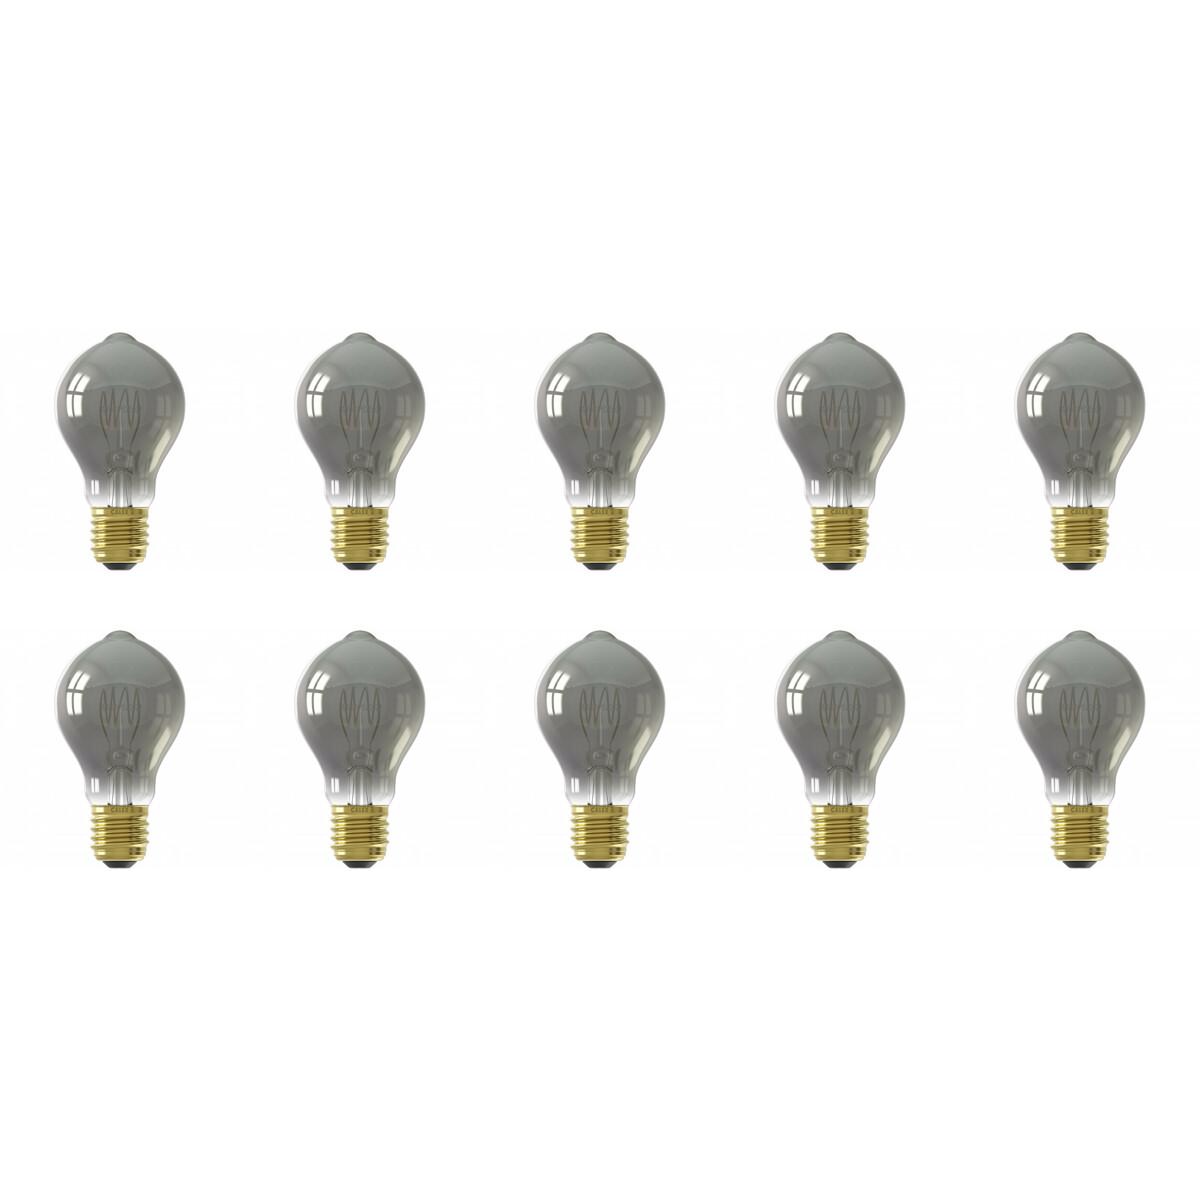 CALEX - LED Lamp 10 Pack - Filament A60 - E27 Fitting - Dimbaar - 4W - Warm Wit 2100K - Titanium